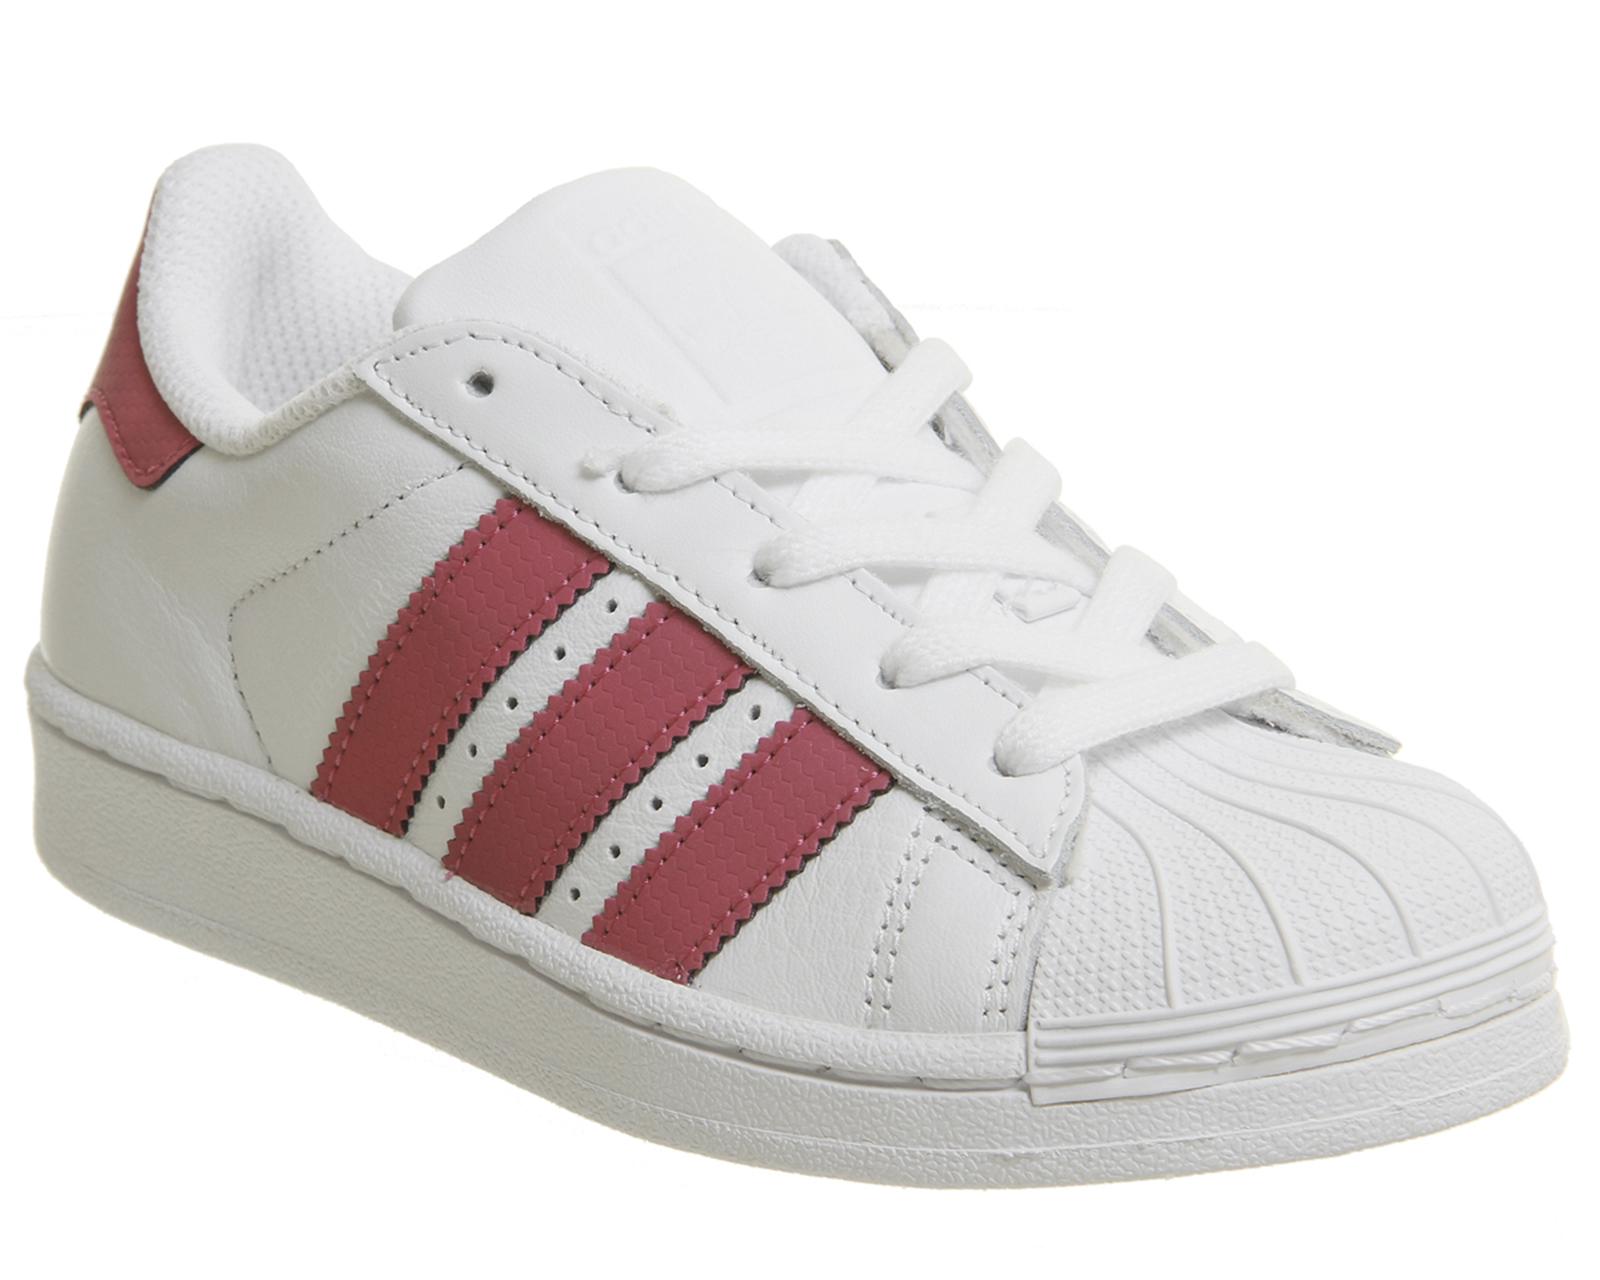 sports shoes d9c5c a4663 ... low cost sentinel bambini adidas superstar bambini 10 2 bianco rosa  kids ffc0c c2dfa